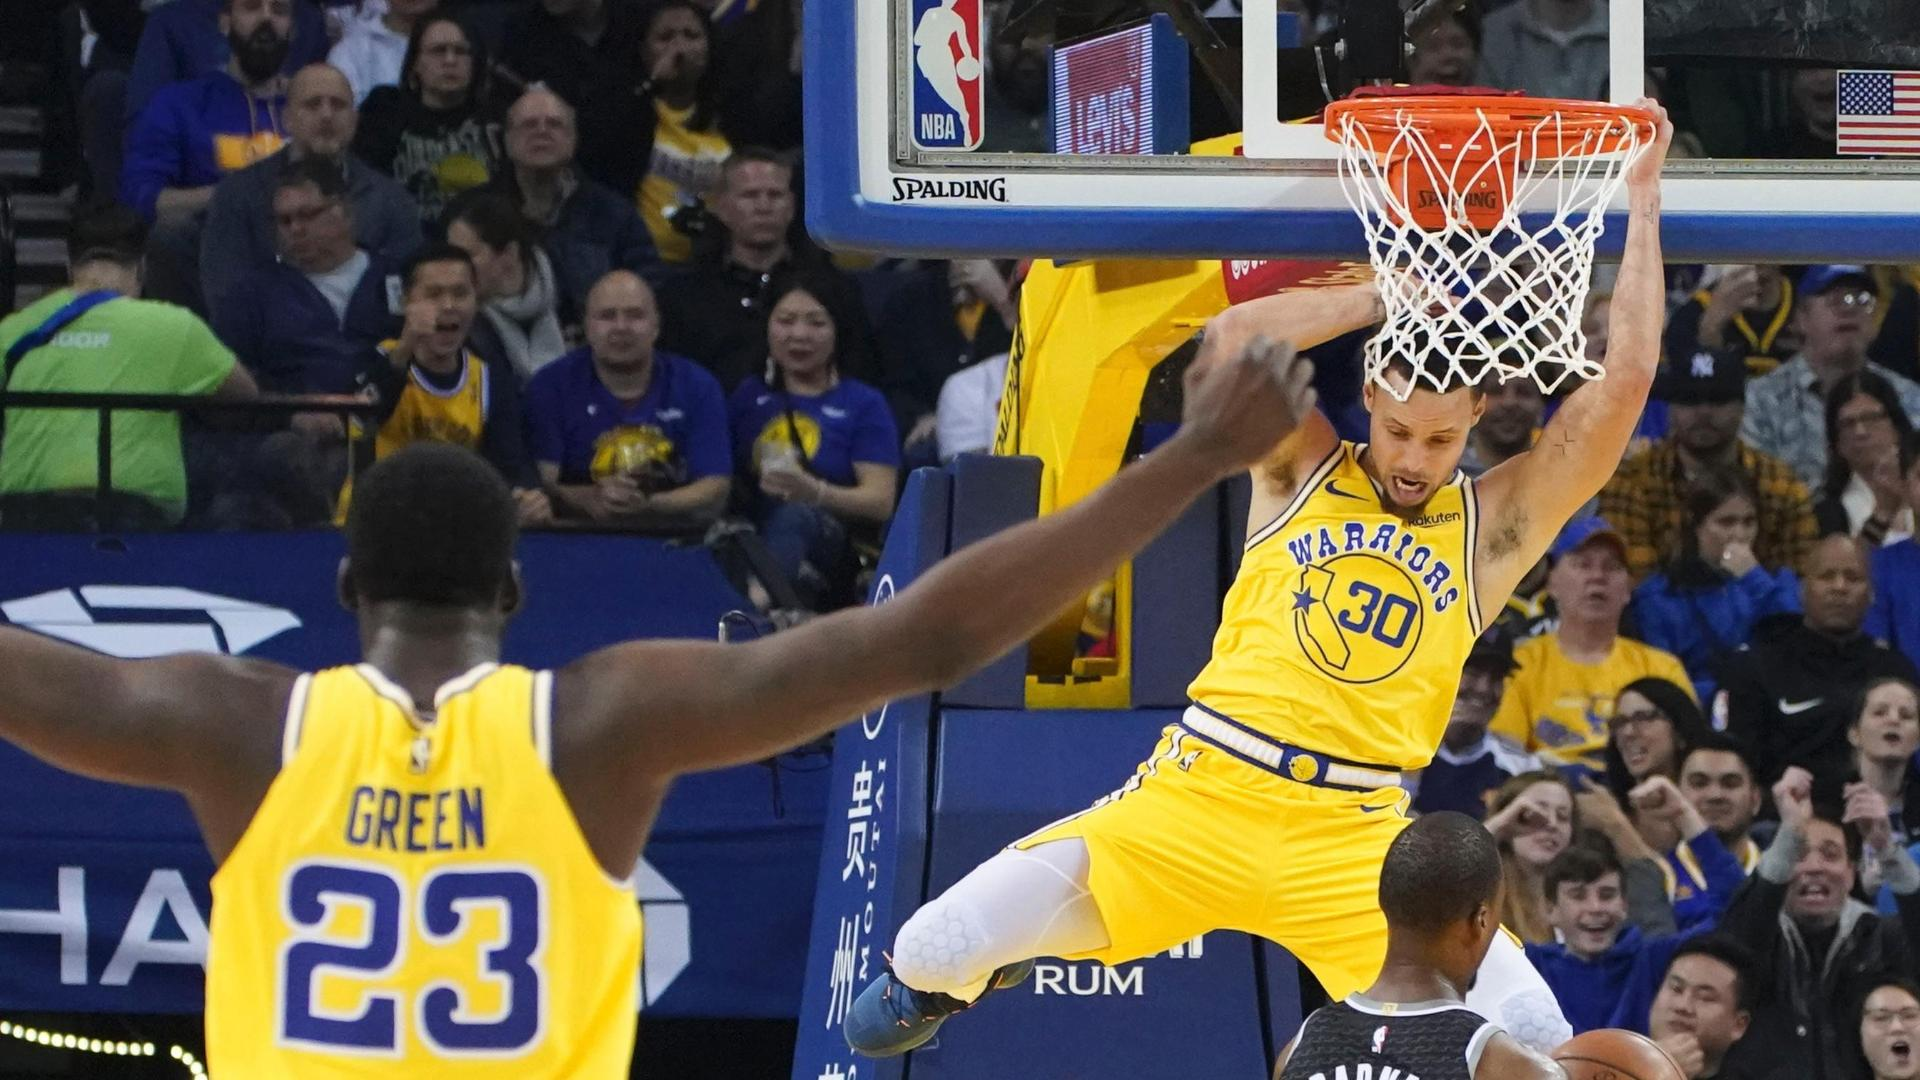 Curry elevates for rare slam